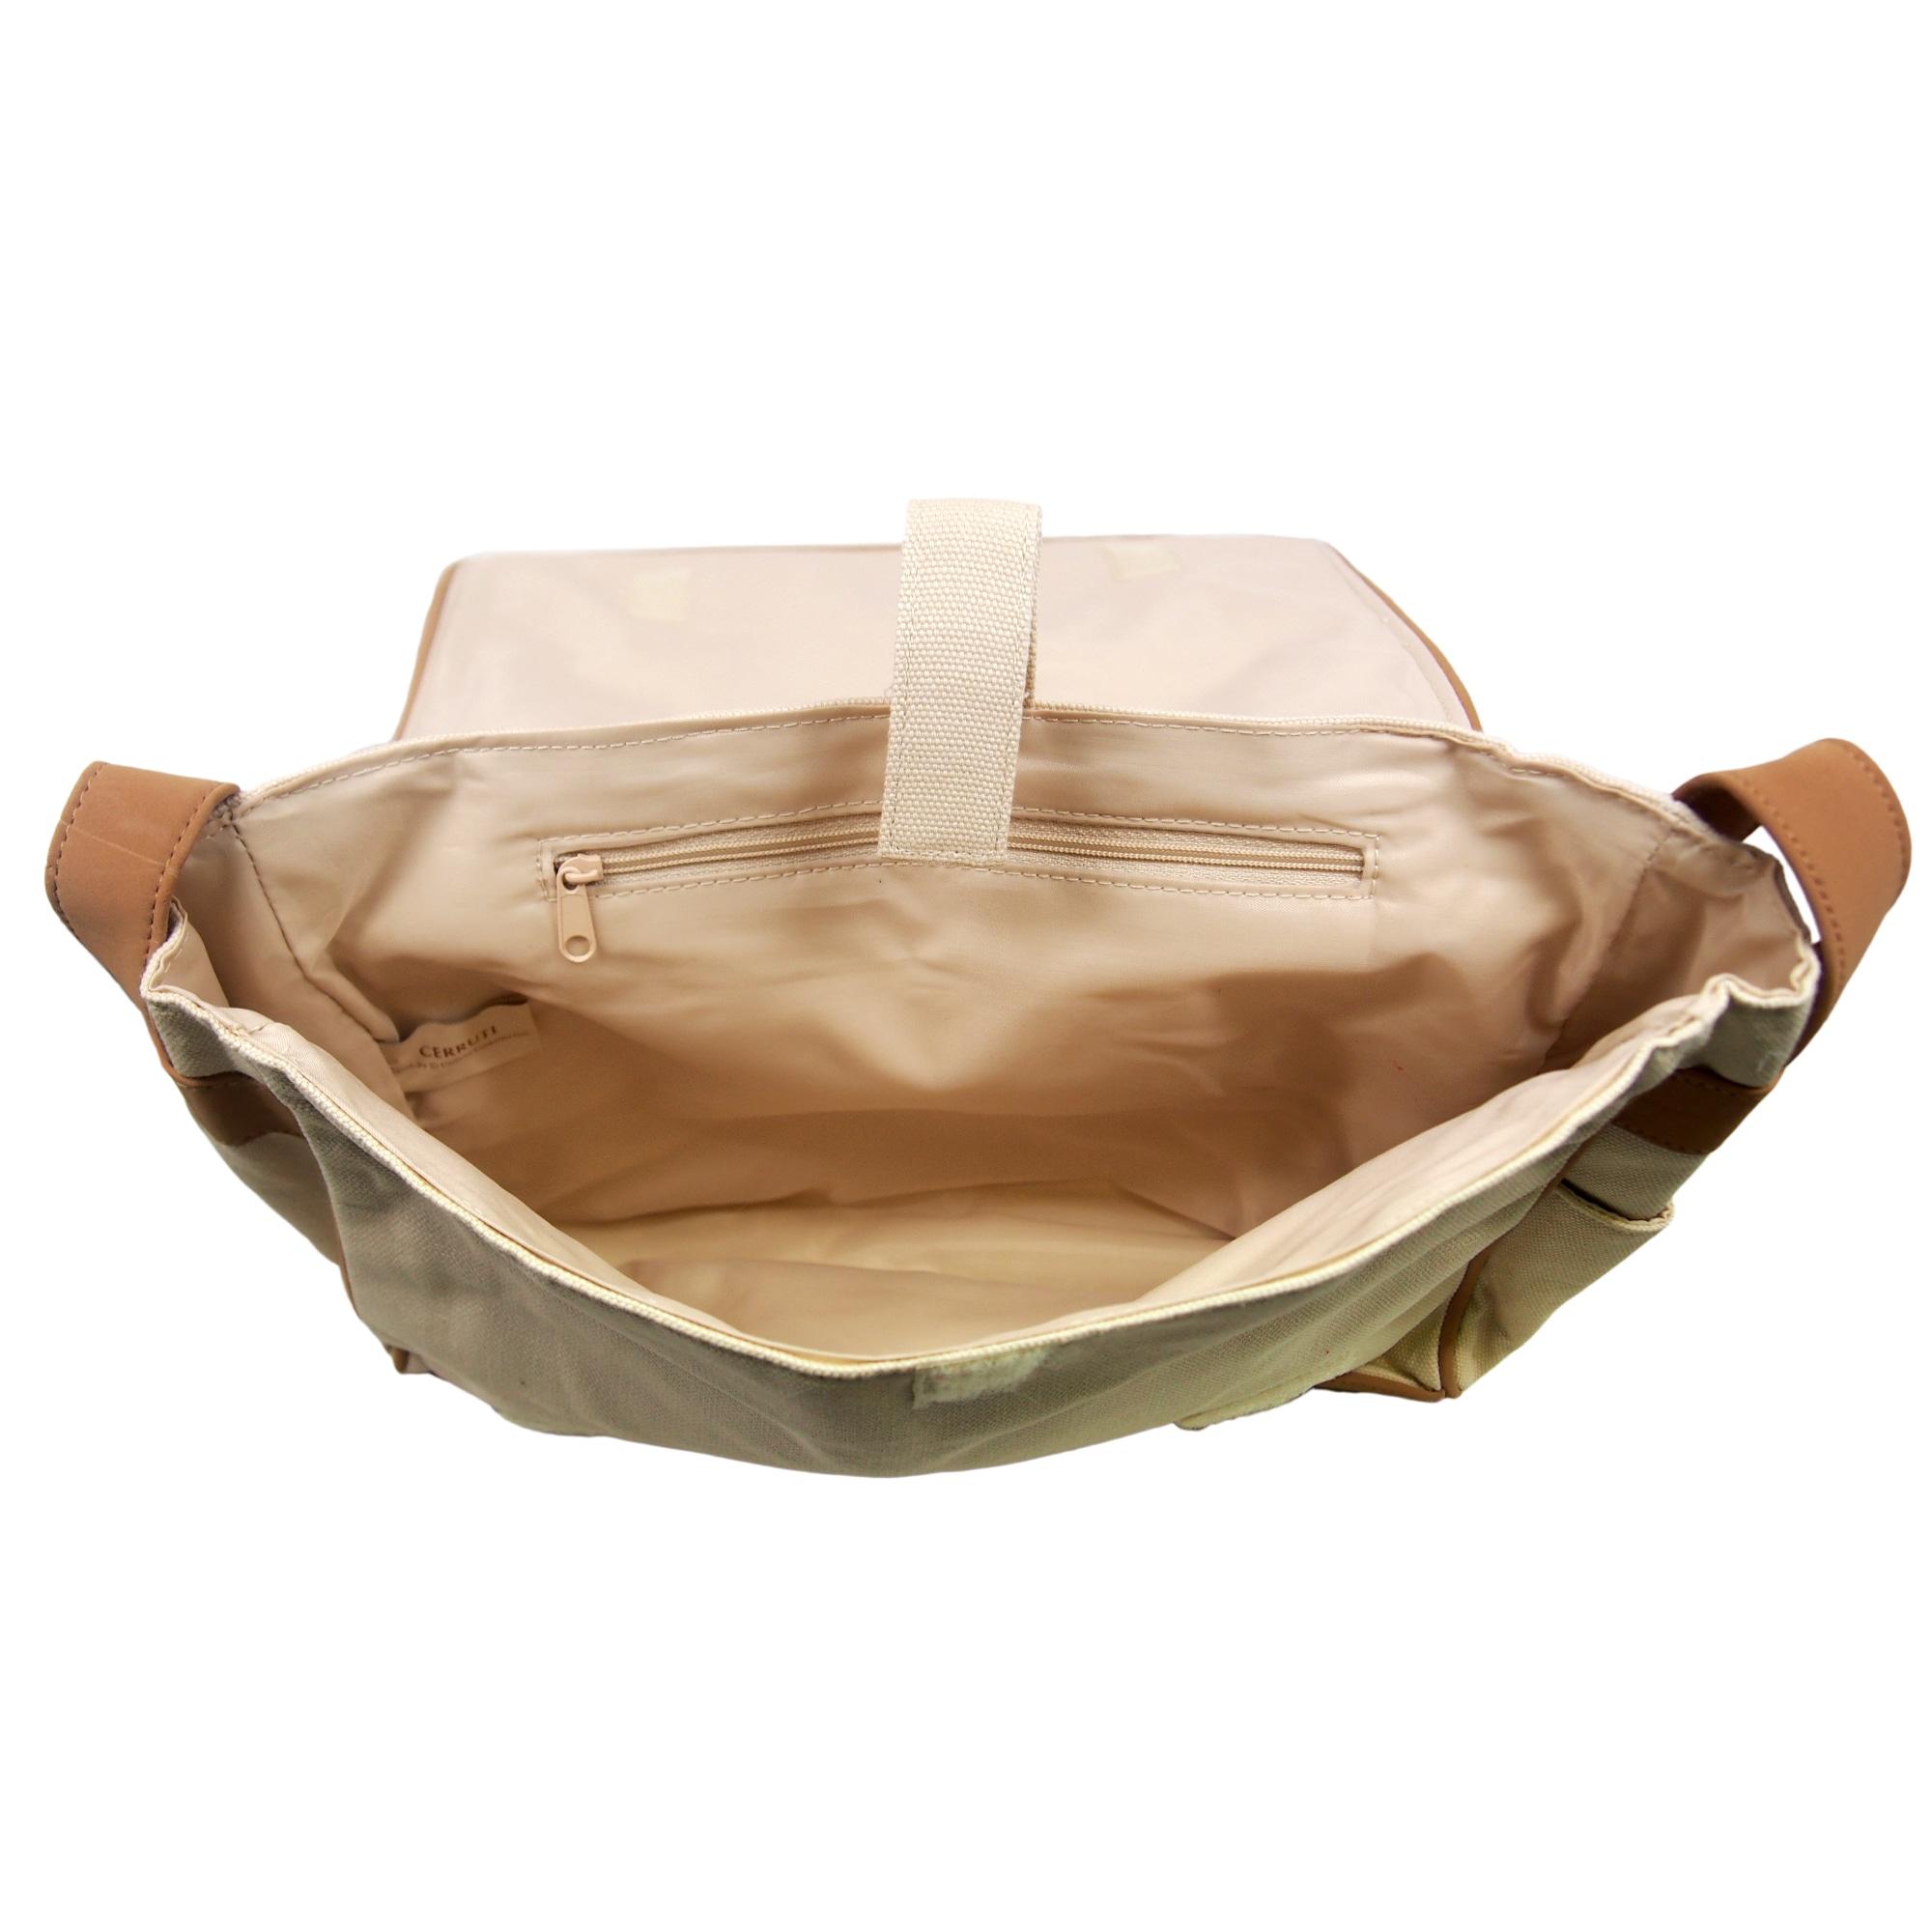 dc3783bbee2 Shop Nino Cerruti 'Cerruti' Cream Canvas Handbag - Free Shipping On Orders  Over $45 - Overstock - 9245602